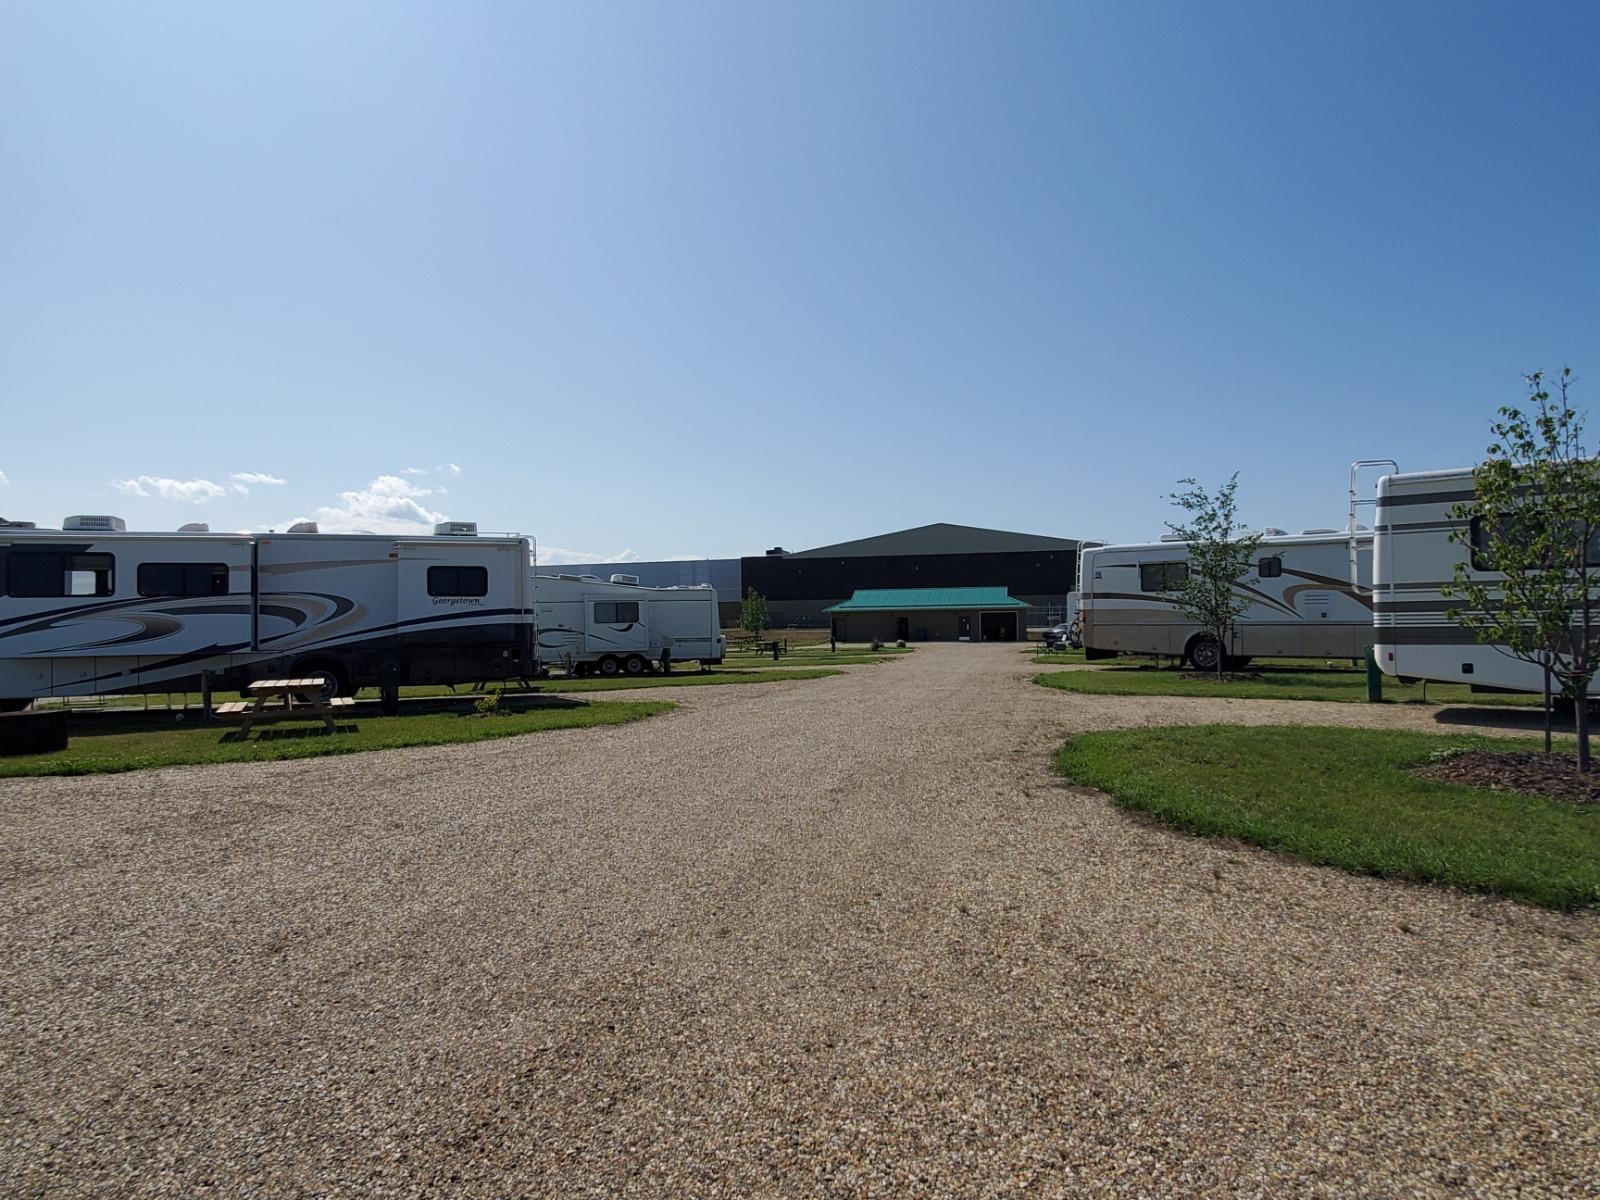 Penhold RV Park